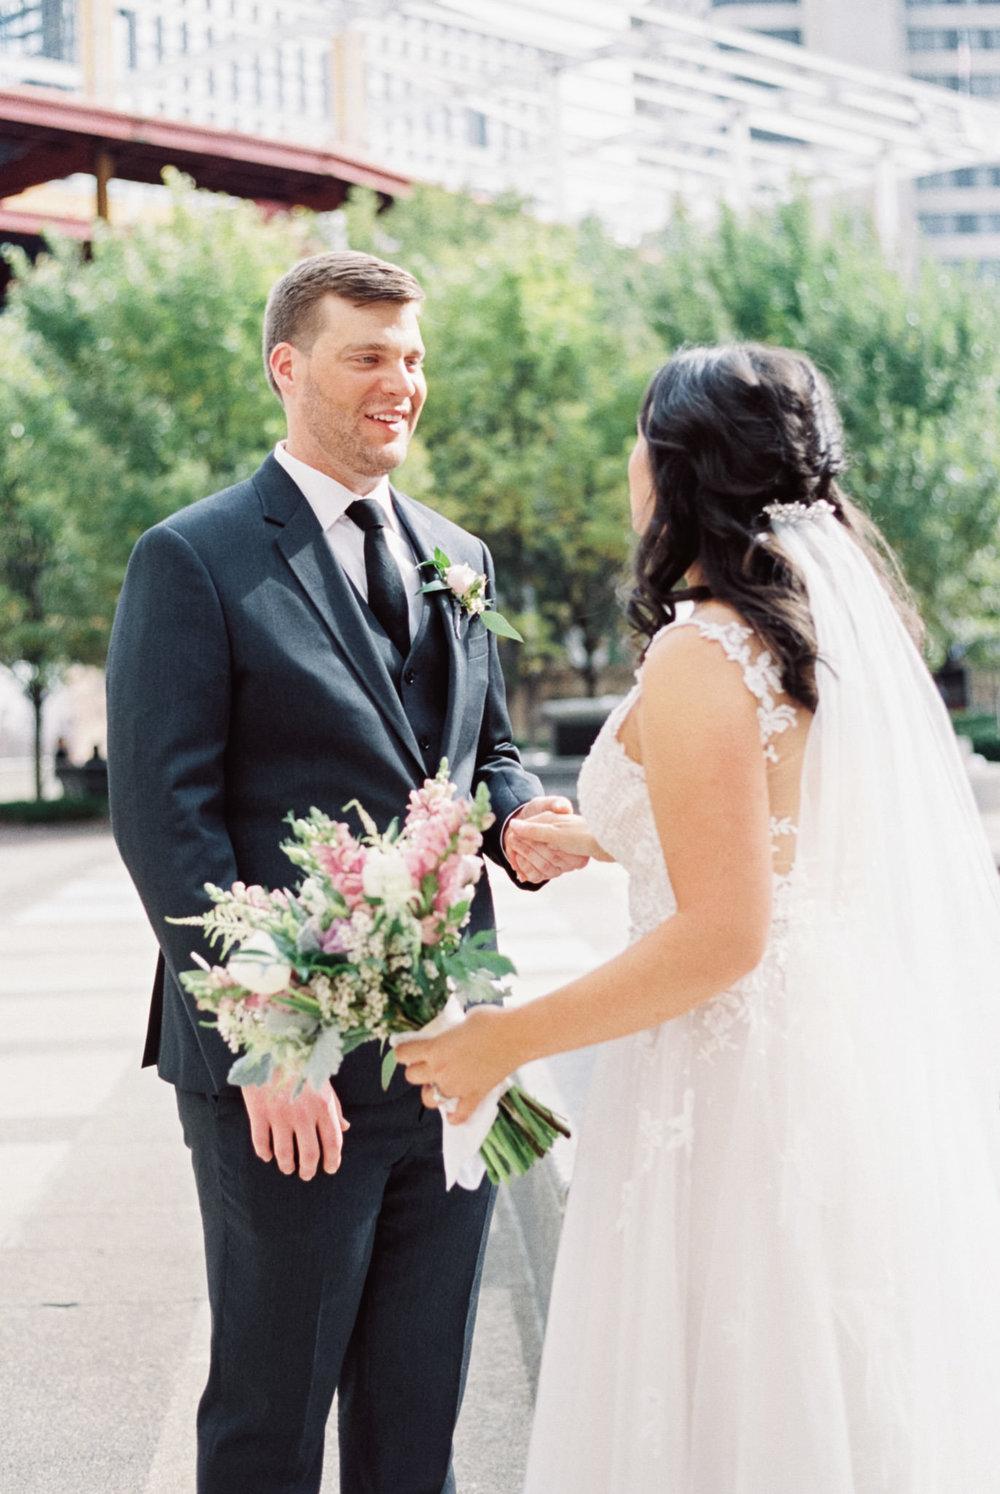 Louisville_Wedding_Mellwood_Arts_Center-20.jpg